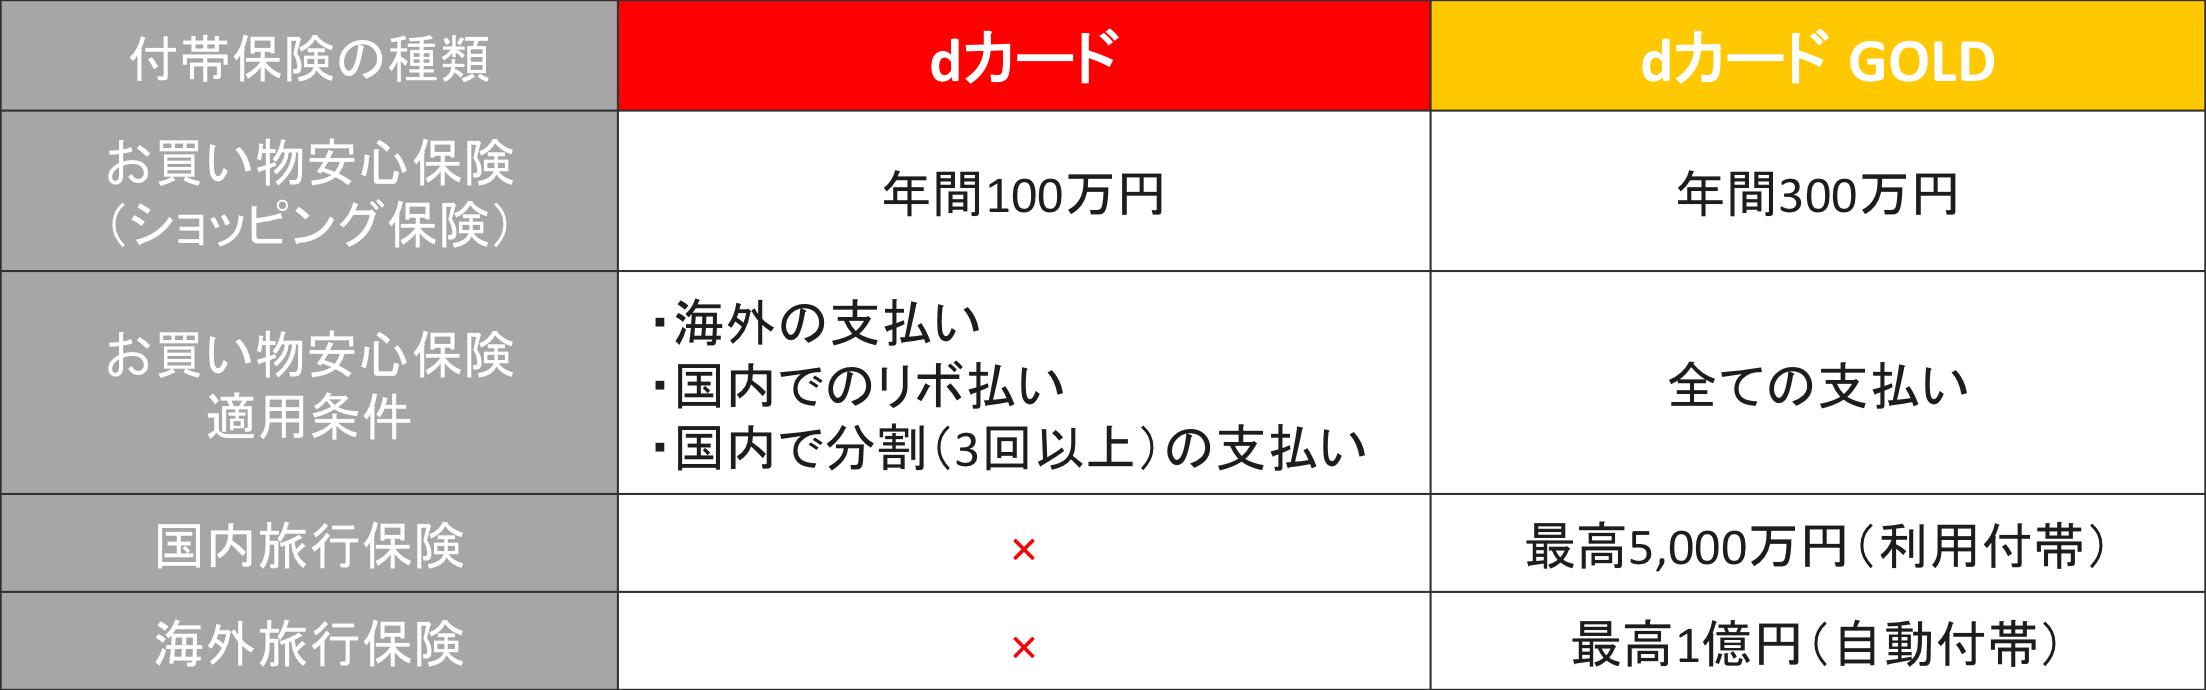 dカード/dカード GOLD 付帯保険